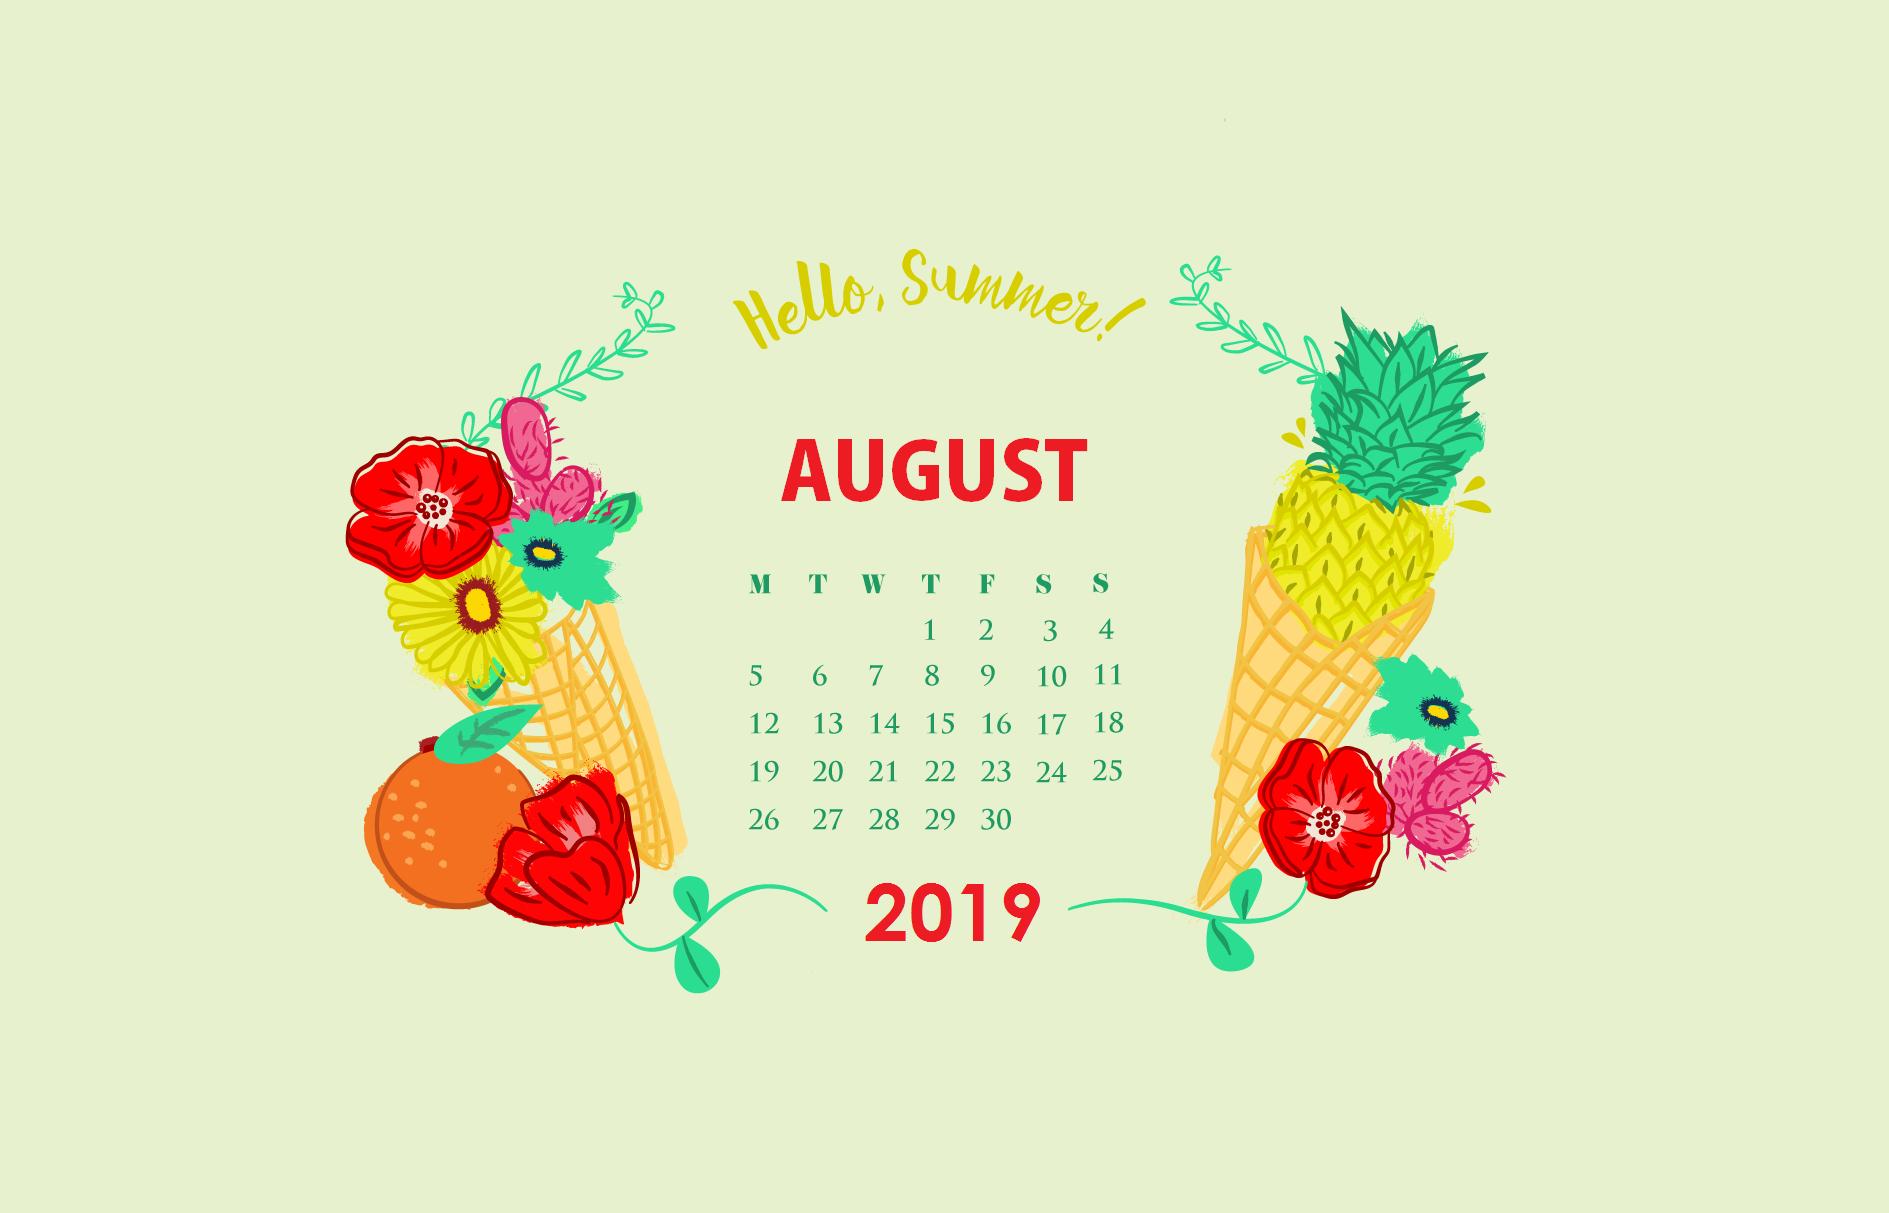 August 2019 Desktop Background Wallpaper